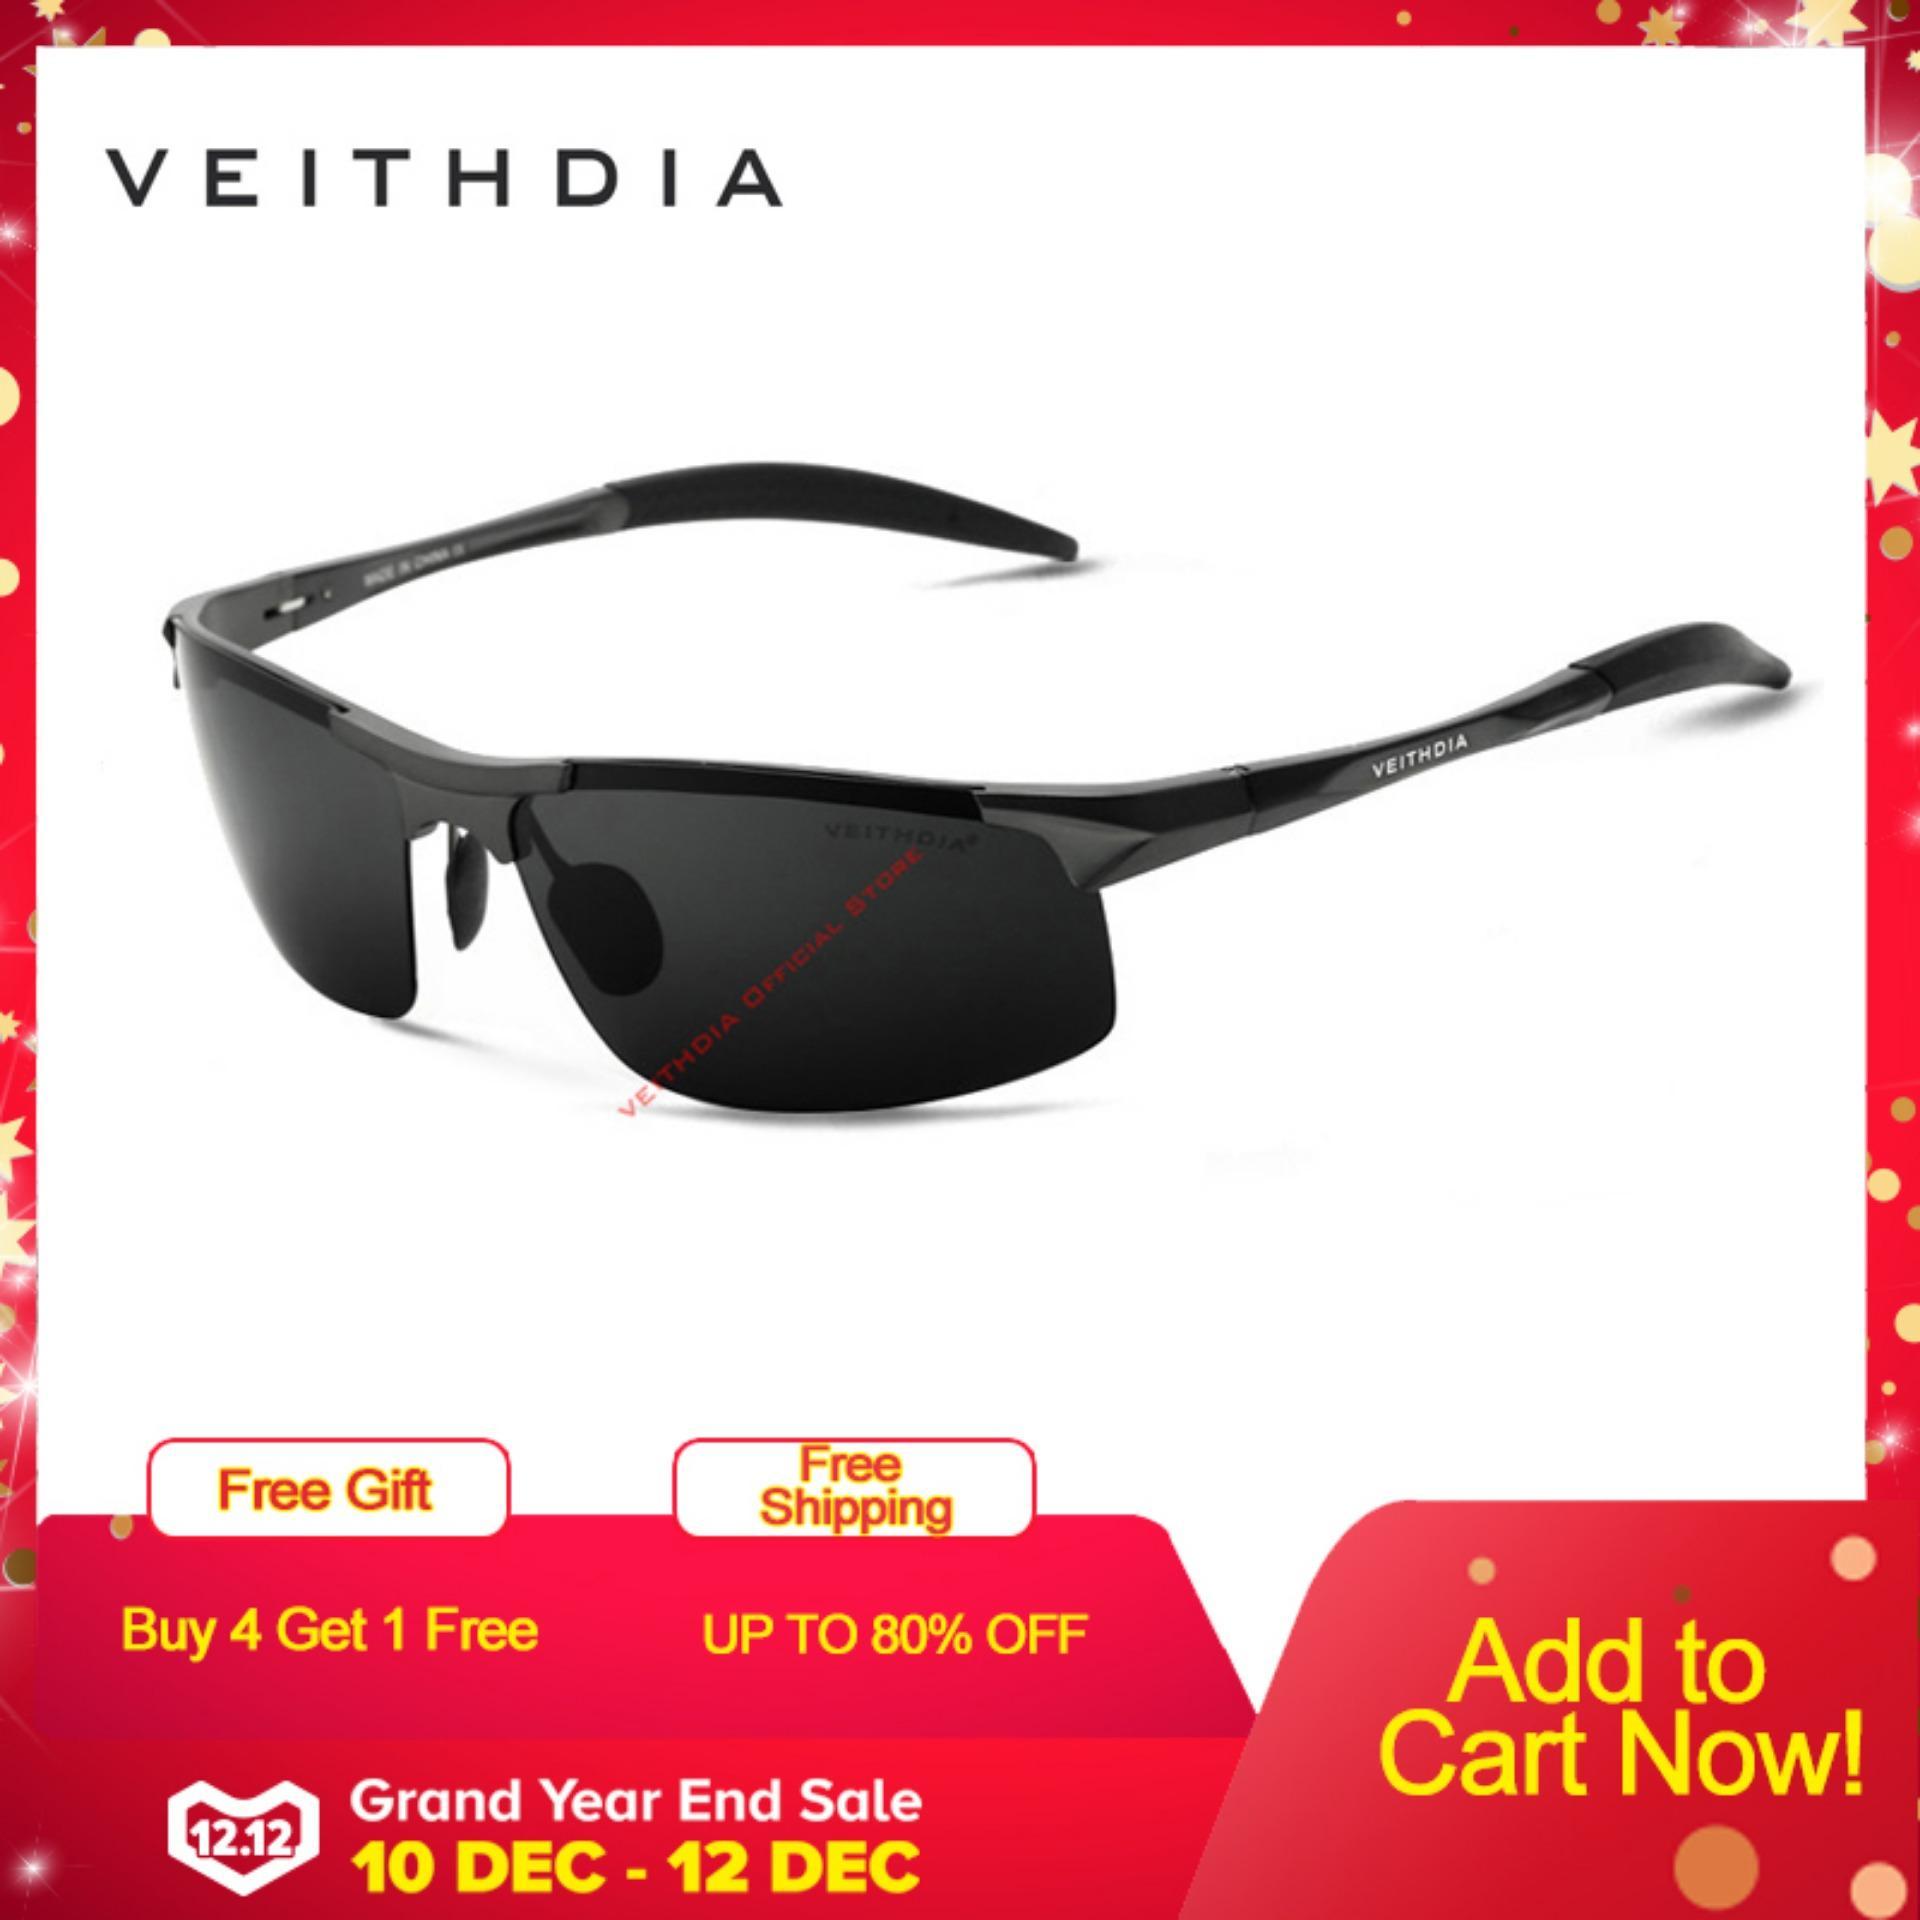 COD+Pengiriman Gratis VEITHDIA Kacamata Hitam Sport Berkendara Bahan  Alumunium Lensa Polarisasi Aksesoris untuk f4eea4ae97